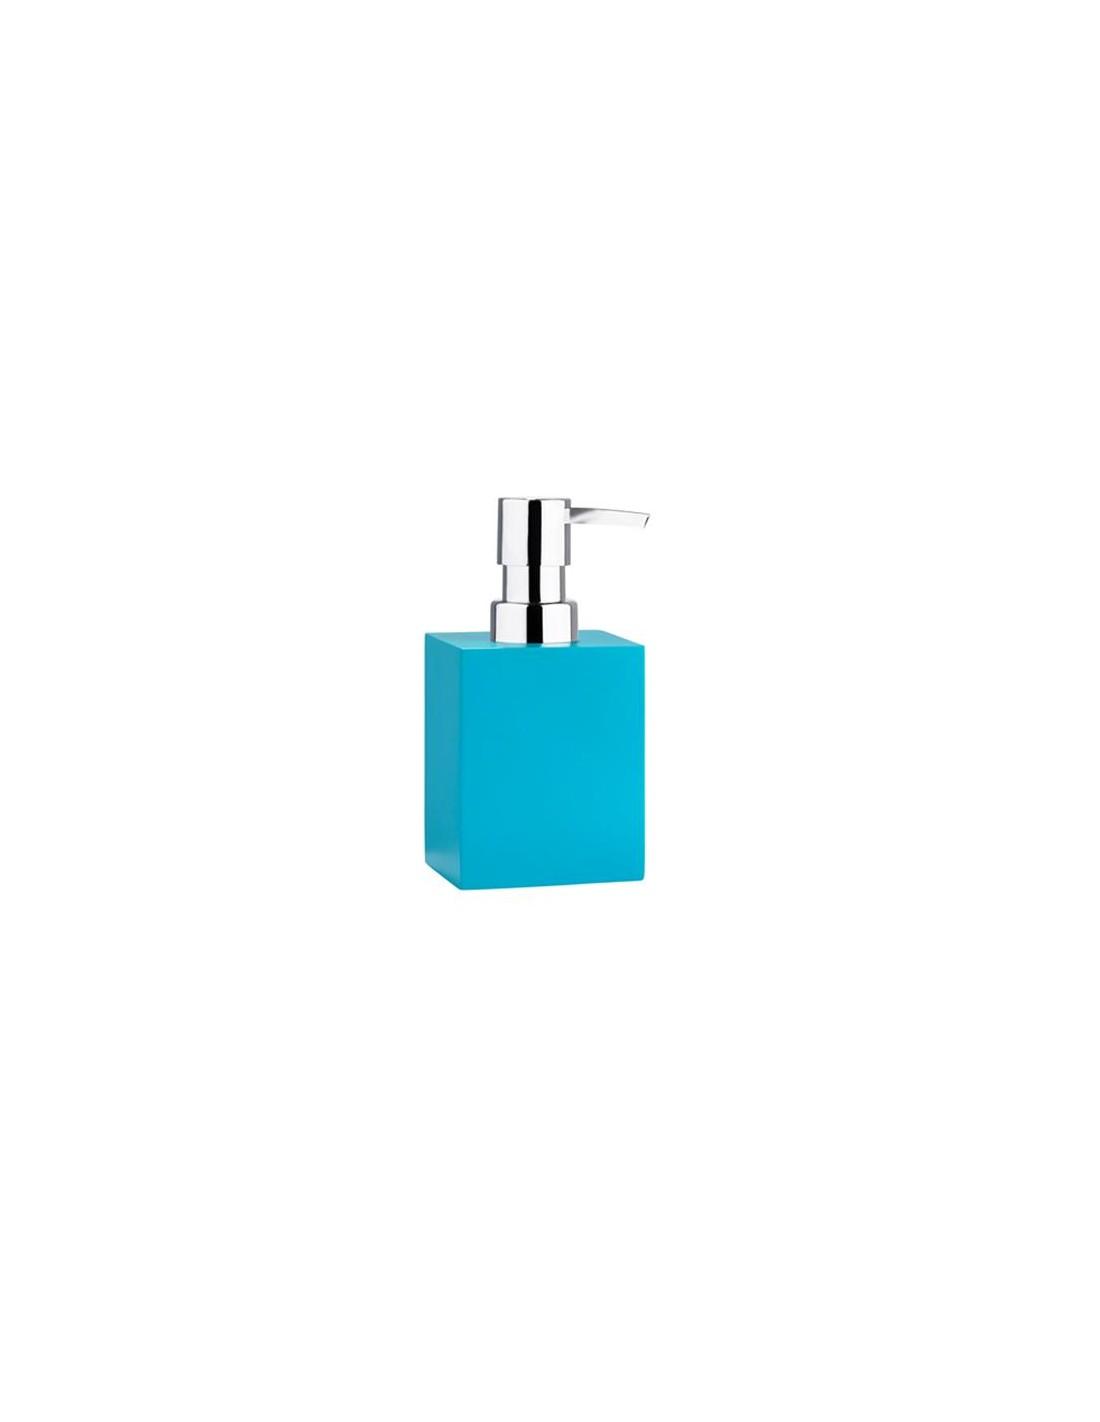 distributeur de savon liquide confetti square bath turquoise de la marque zone. Black Bedroom Furniture Sets. Home Design Ideas